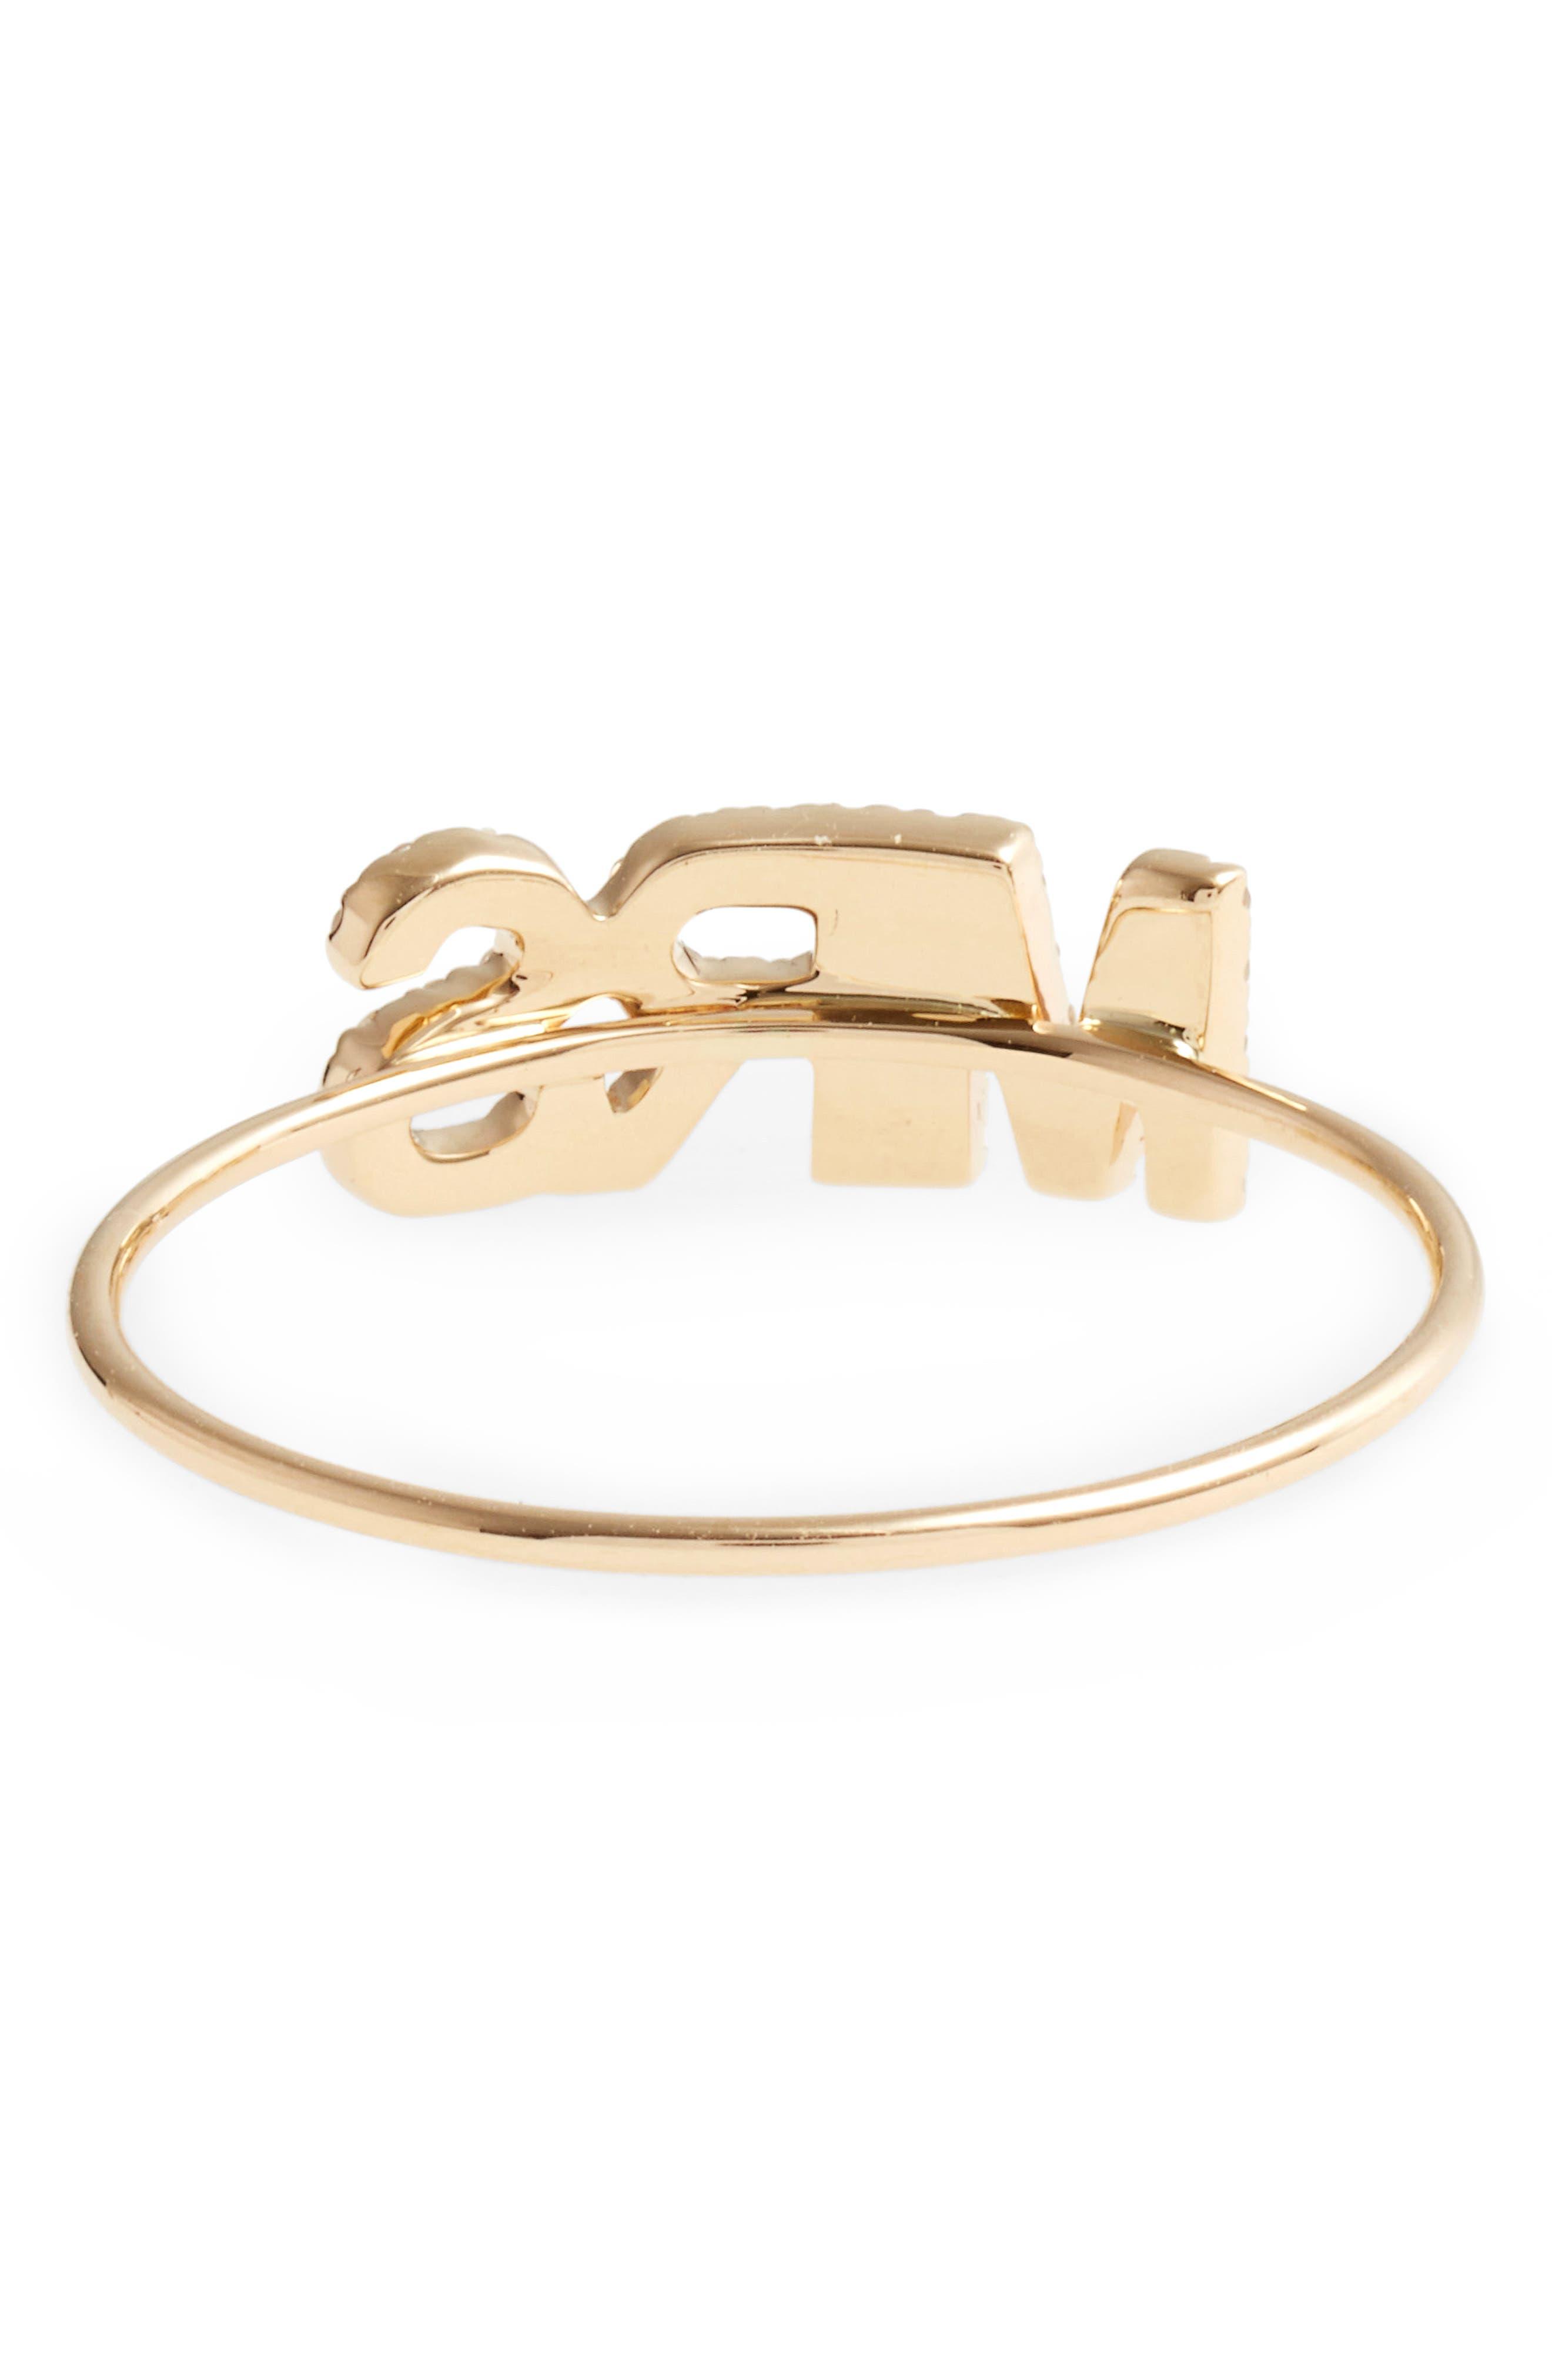 Mrs. Diamond Ring,                             Alternate thumbnail 4, color,                             YELLOW GOLD